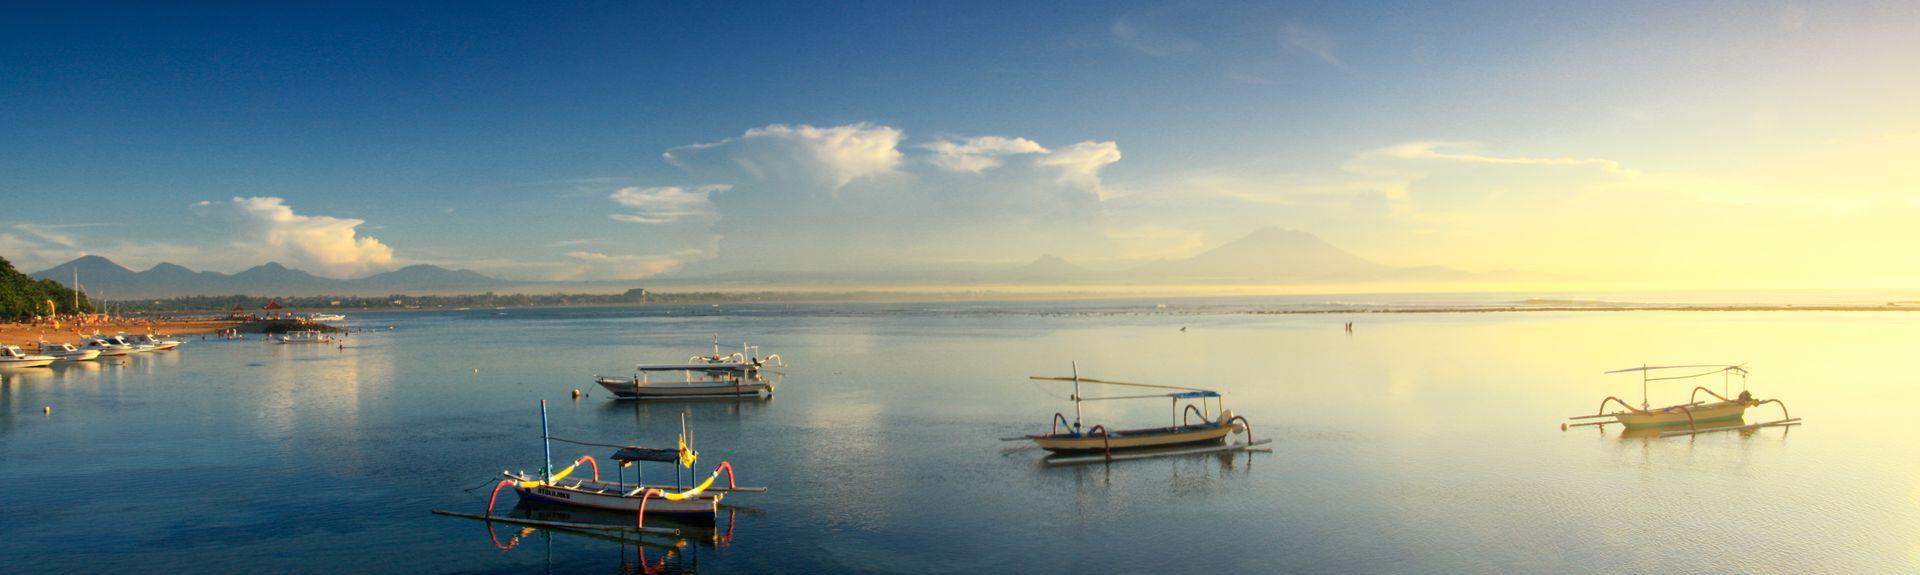 Praia de Sanur, Denpasar, Bali, Indonésia